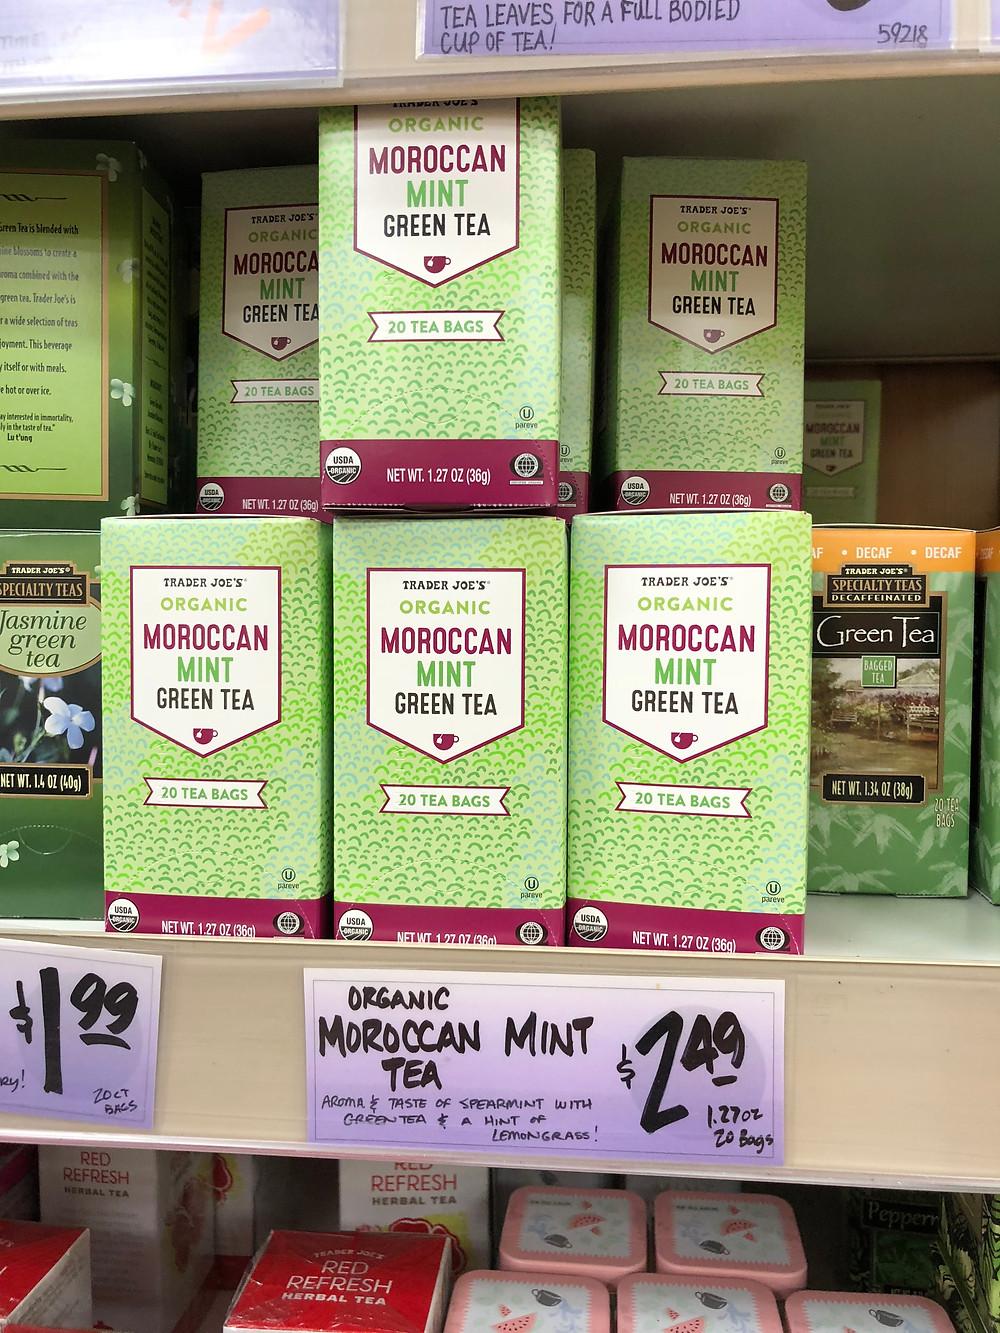 Trader Joes Moroccan mint green tea